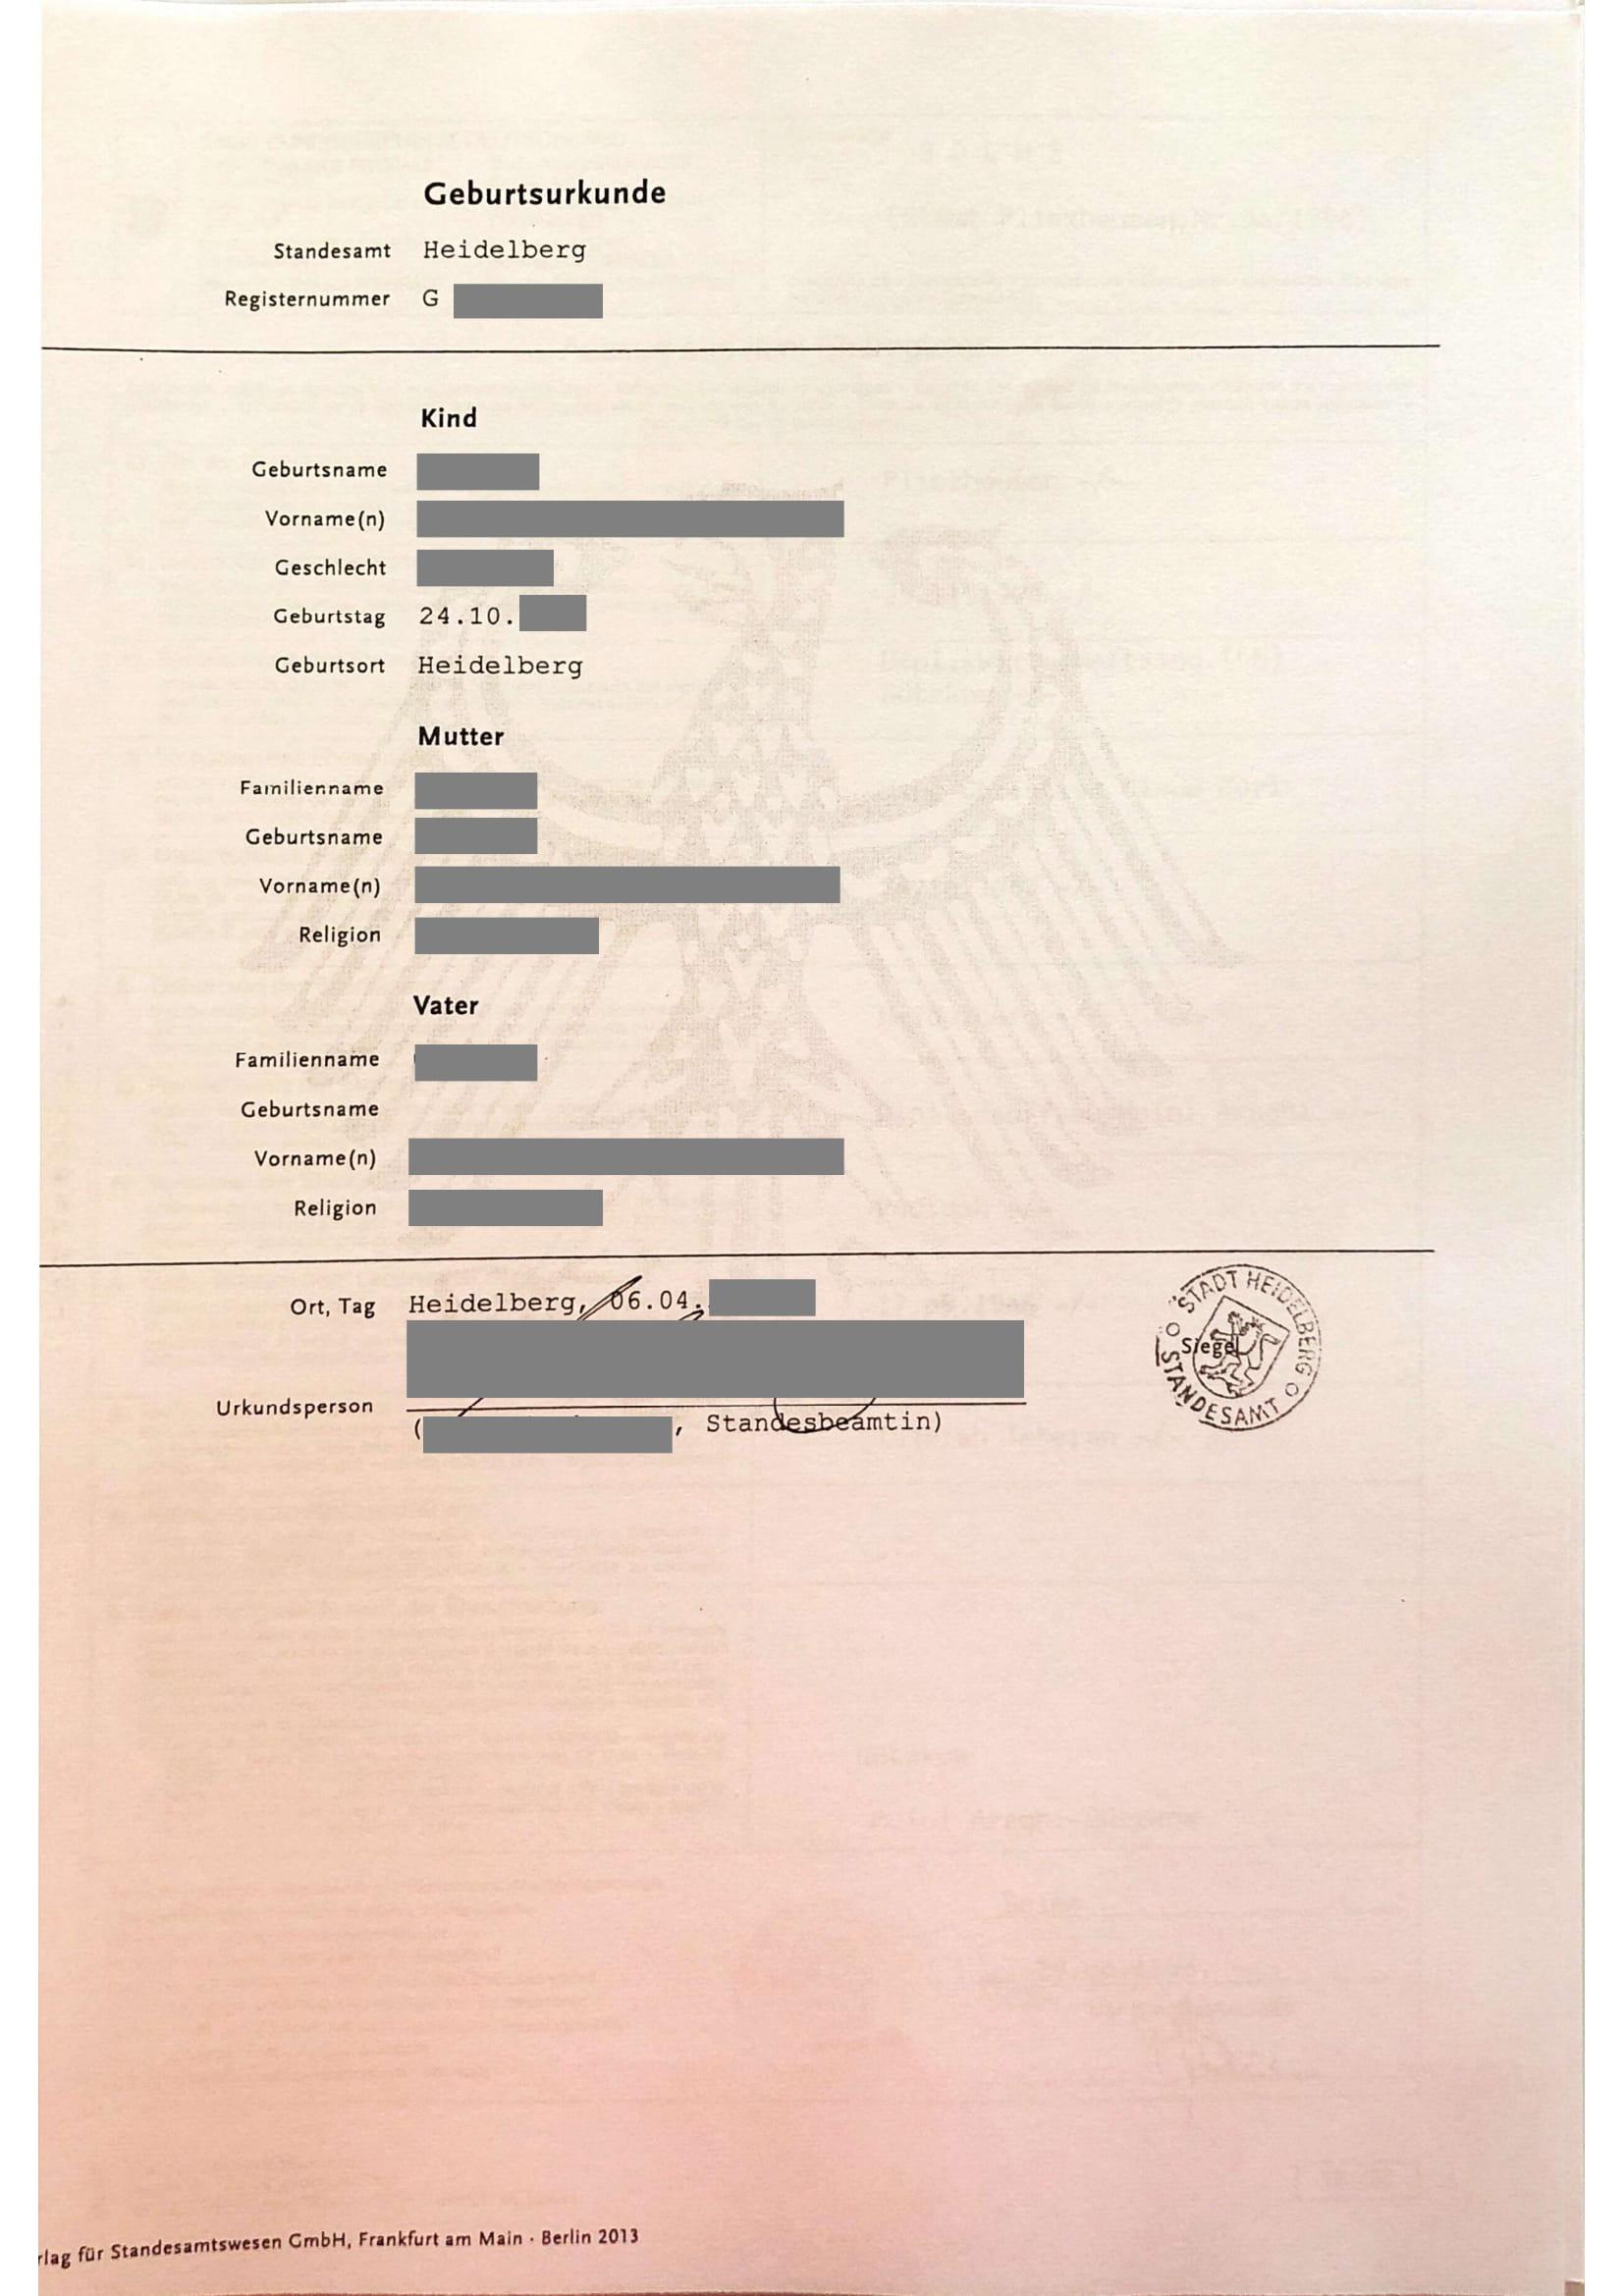 Beglaubigte Übersetzung Geburtsurkunde DE-1